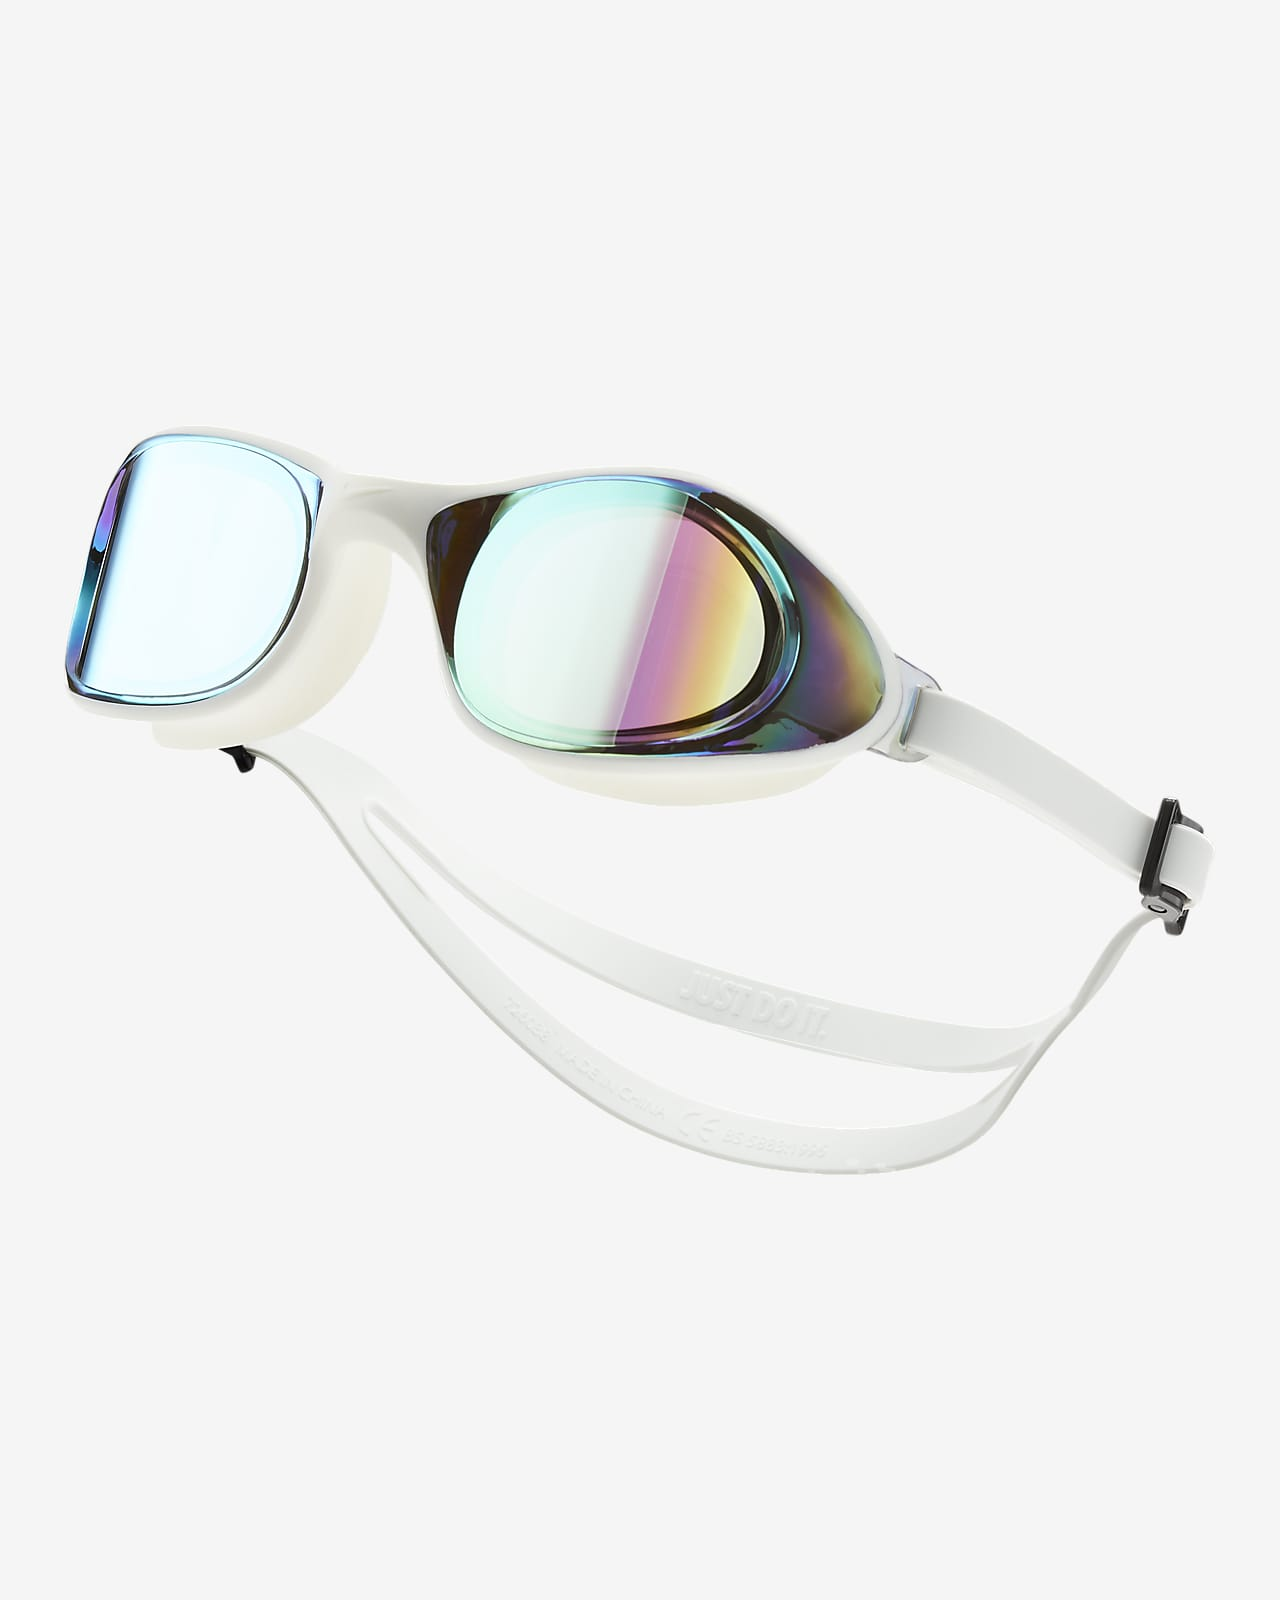 Nike Expanse Mirror Swim Goggles